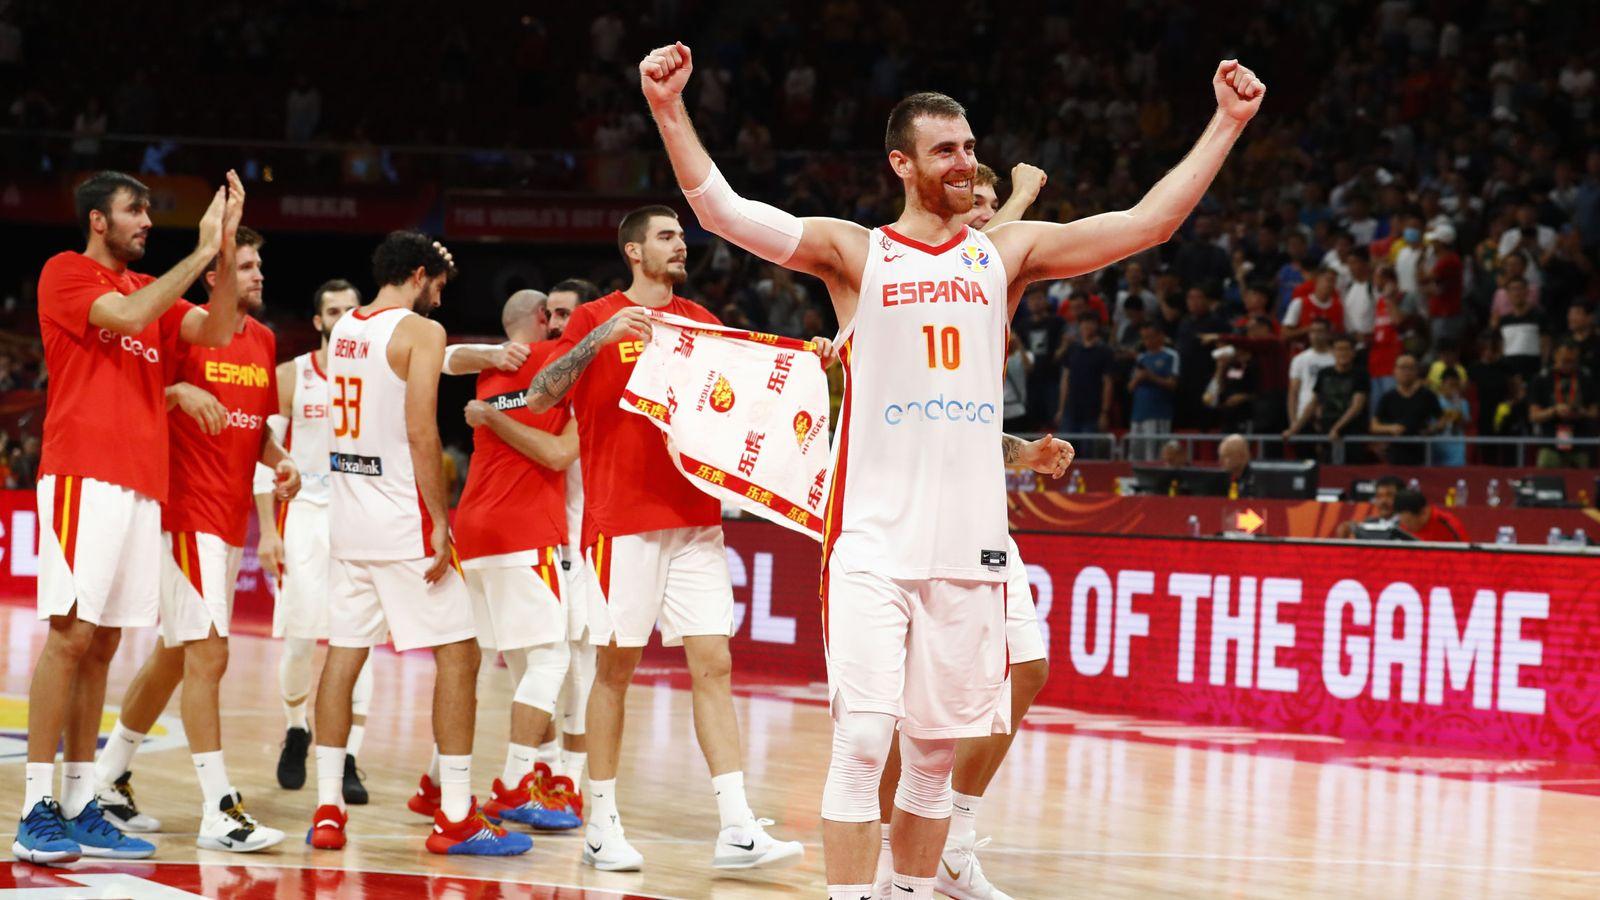 Foto: Basketball - fiba world cup - semi finals - spain v australia